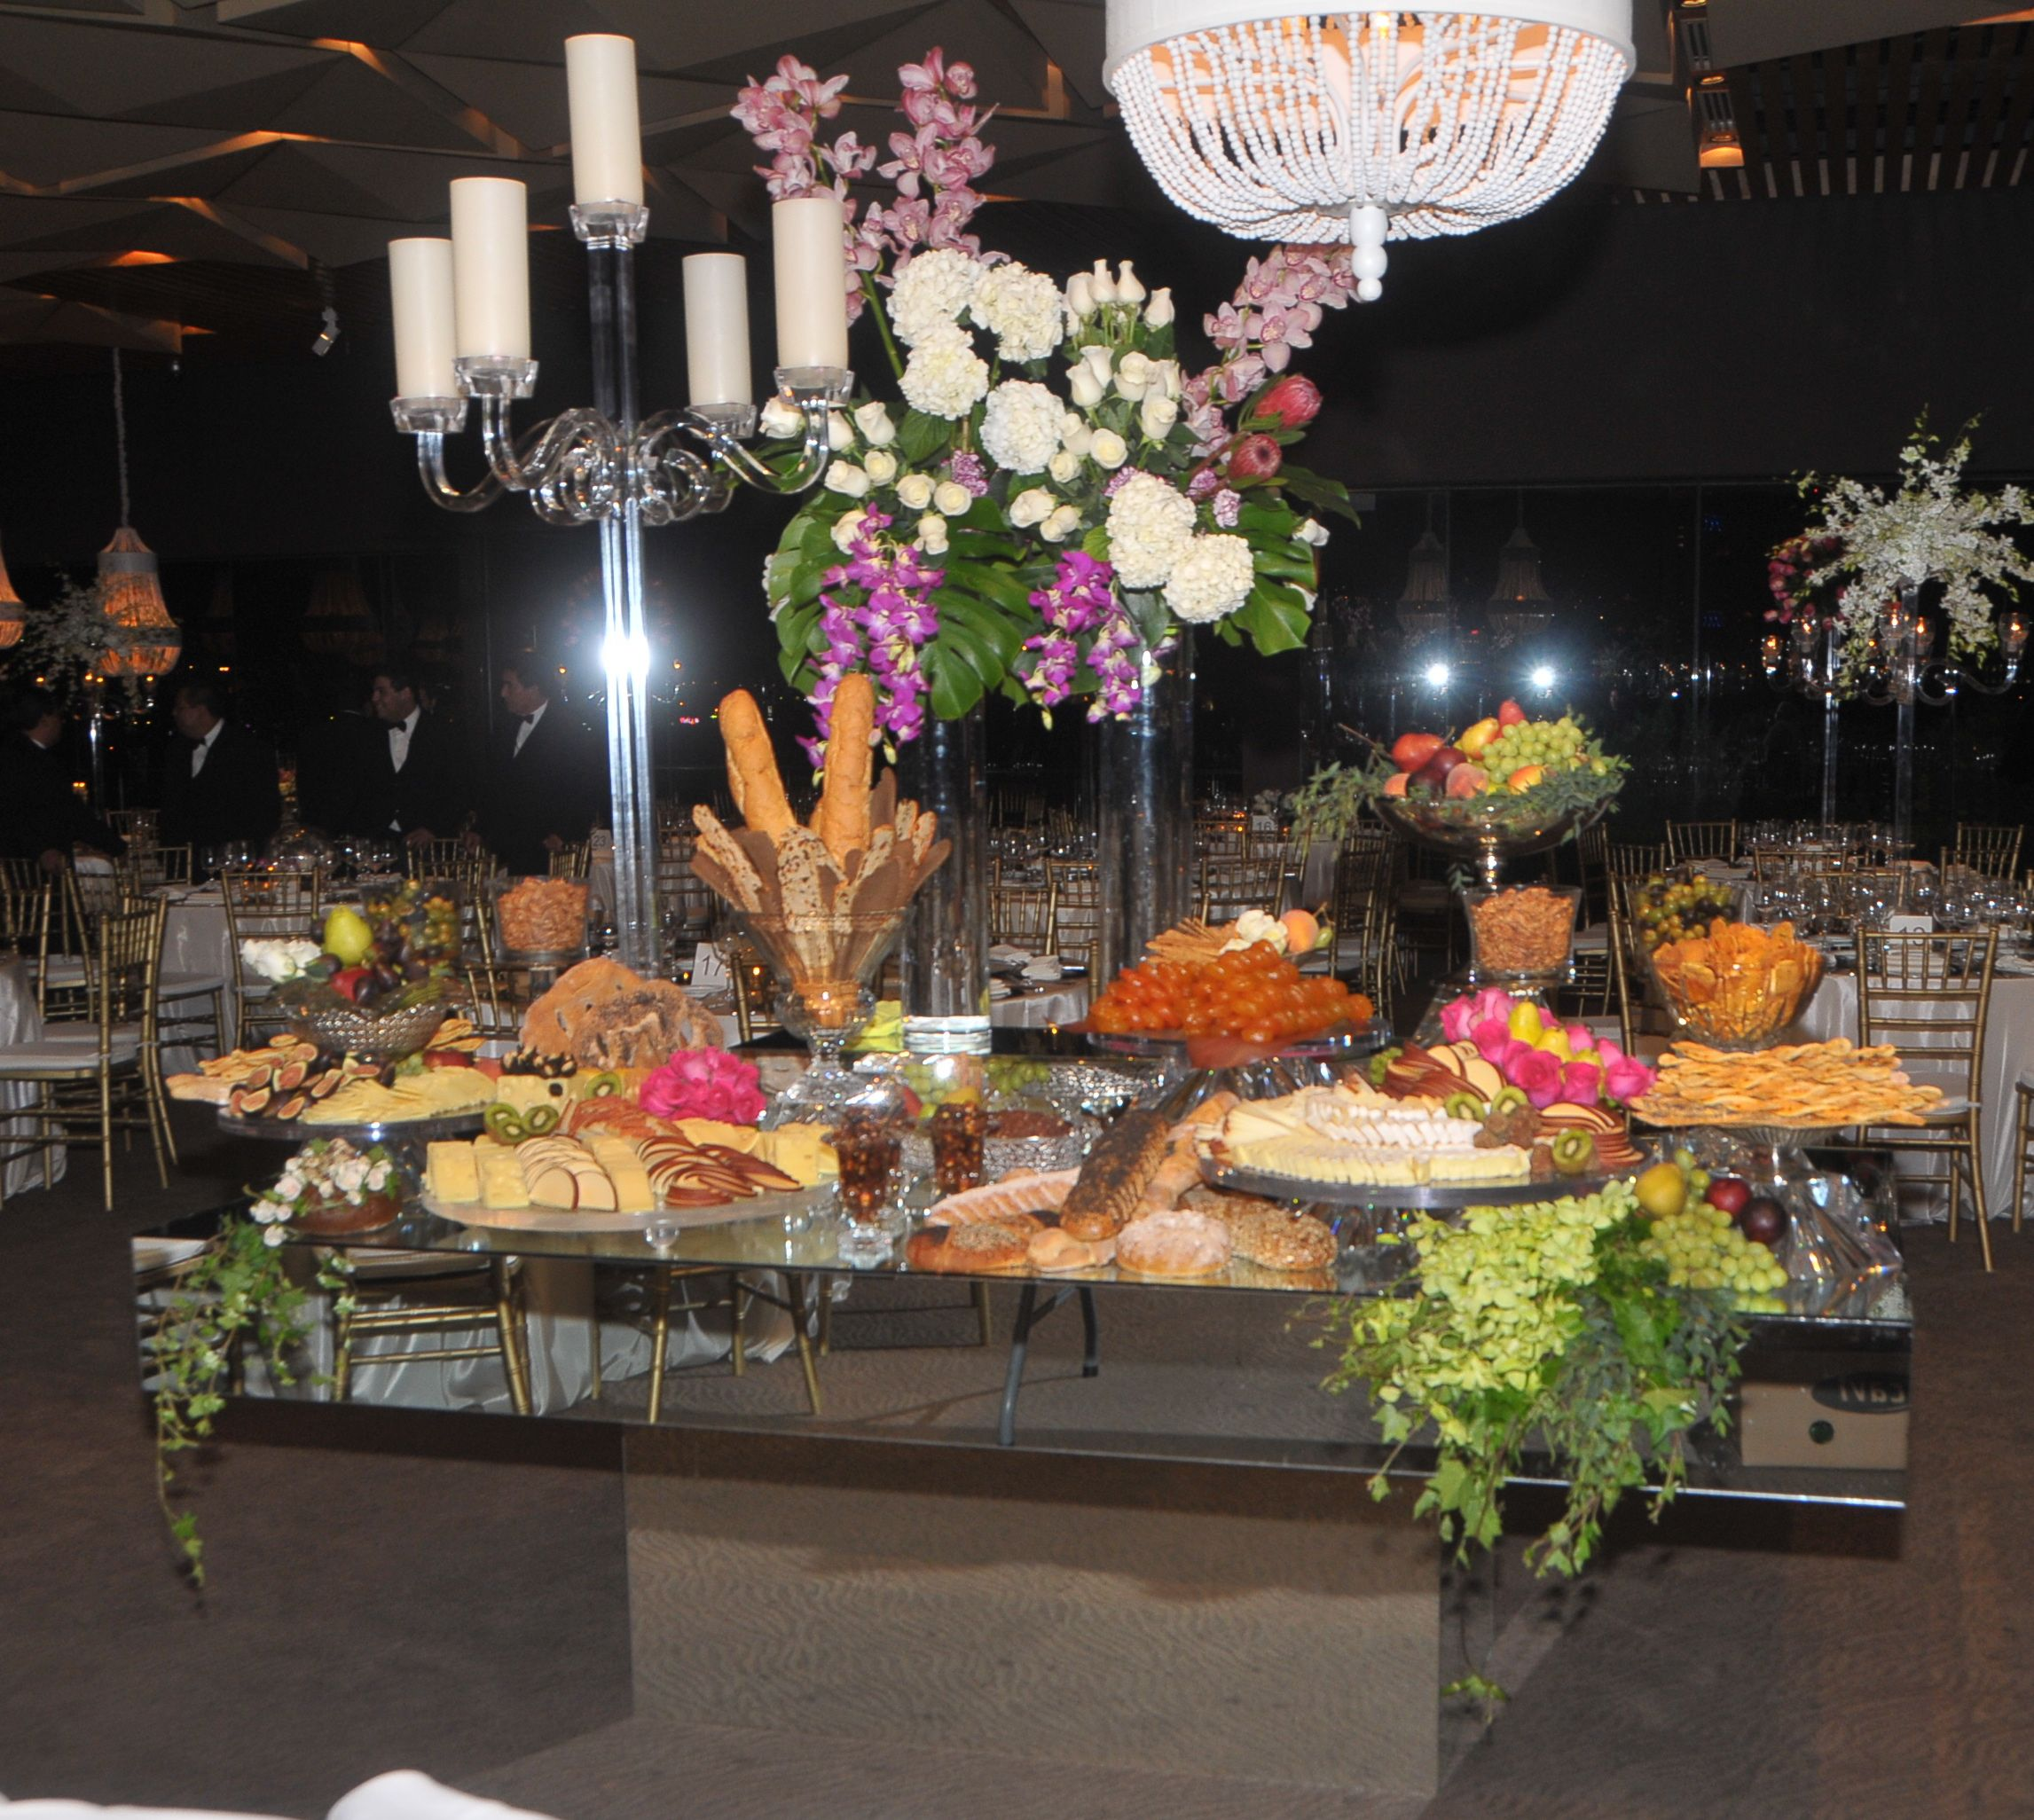 Mesa espejo como mesa de quesos en boda mesas de quesos for Mesa espejo